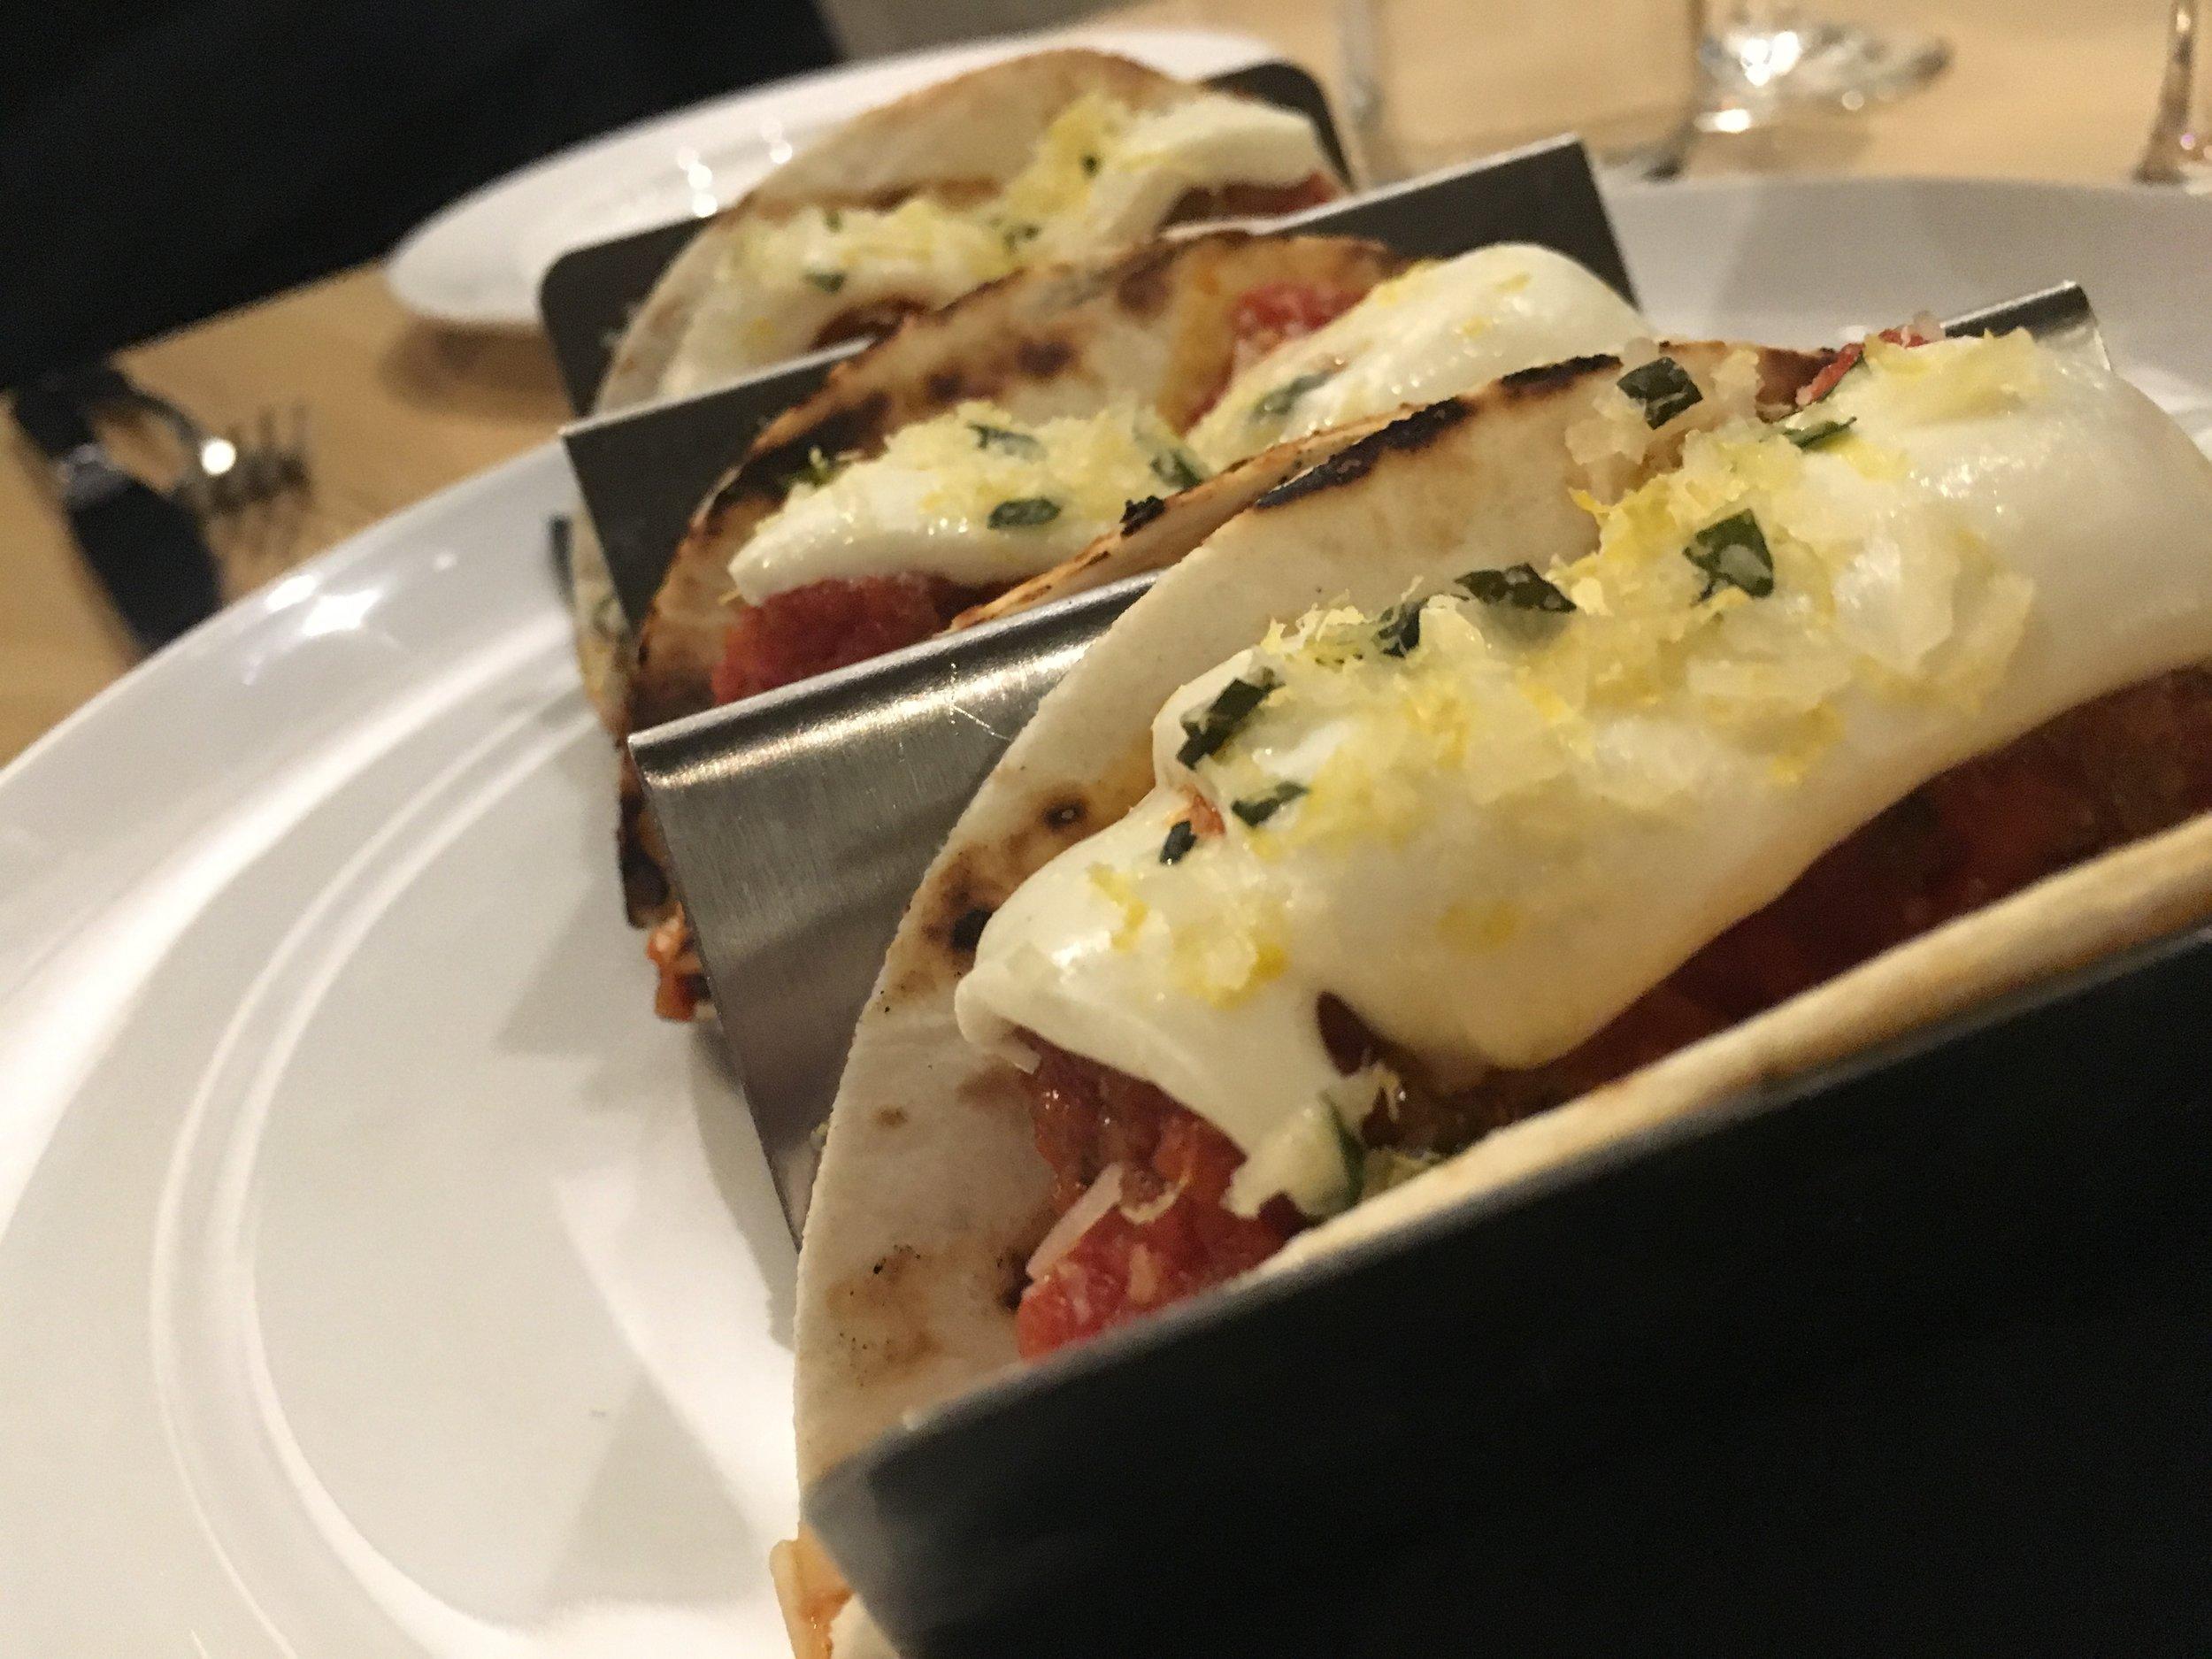 Mozzarella on a taco: Intriguing and probably wrong.